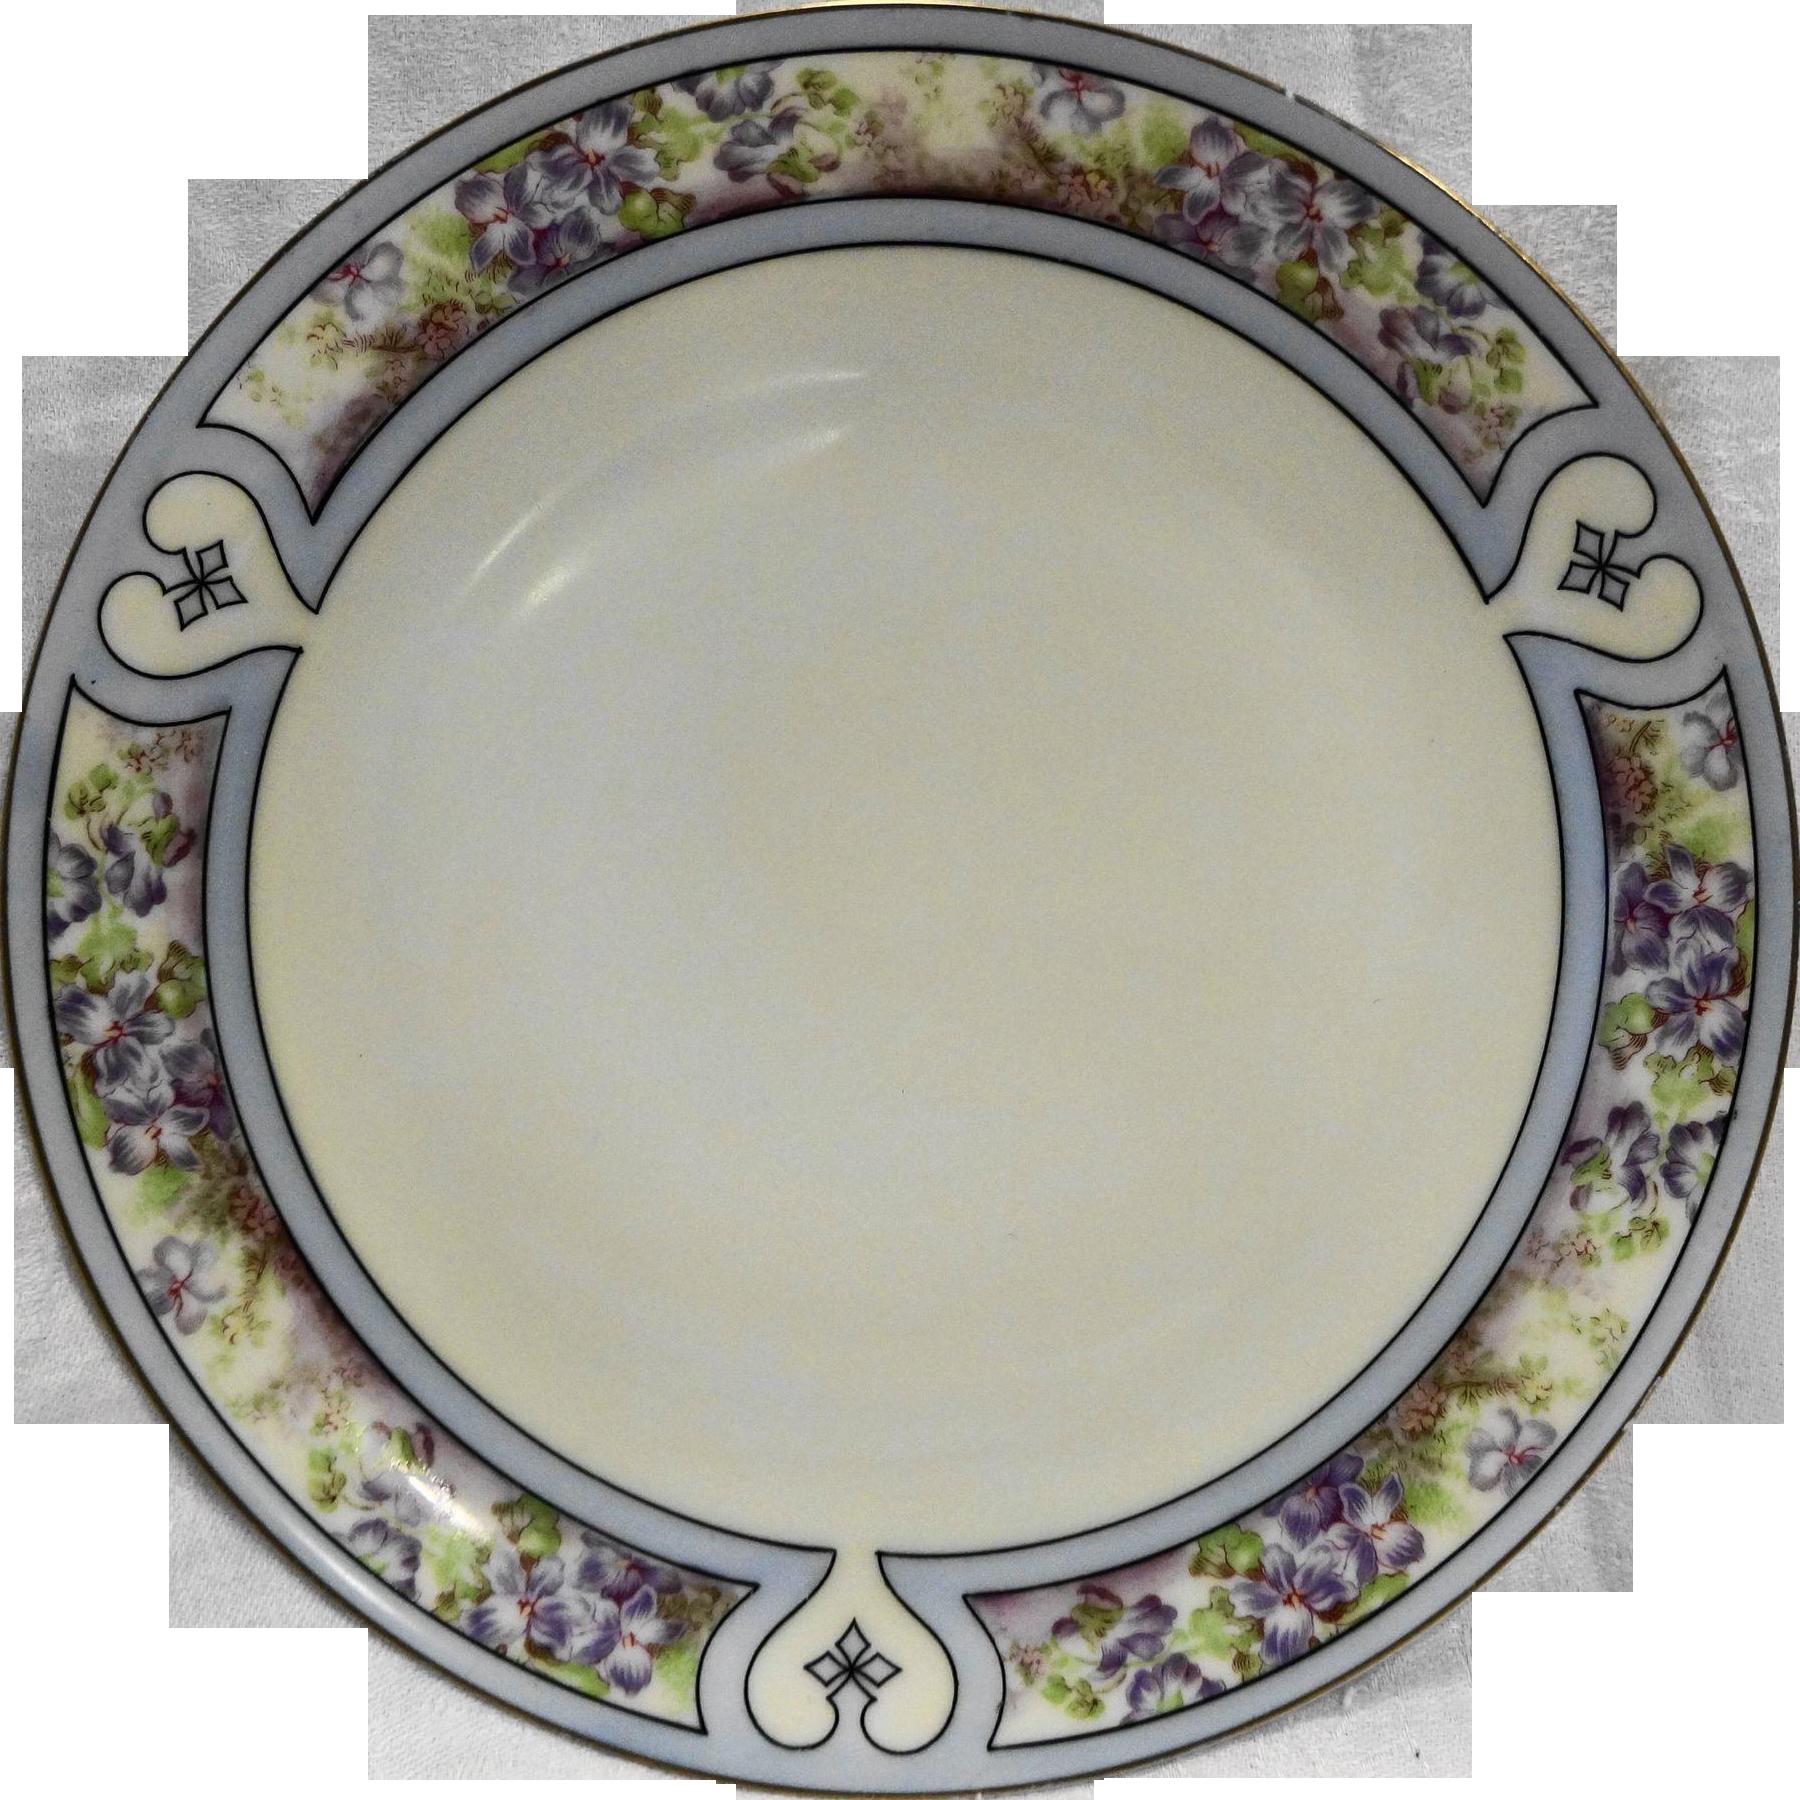 Hutschenreuther Favorite Bavaria Cabinet Plate Hand Painted Flowers Gold Trim Arts & Crafts